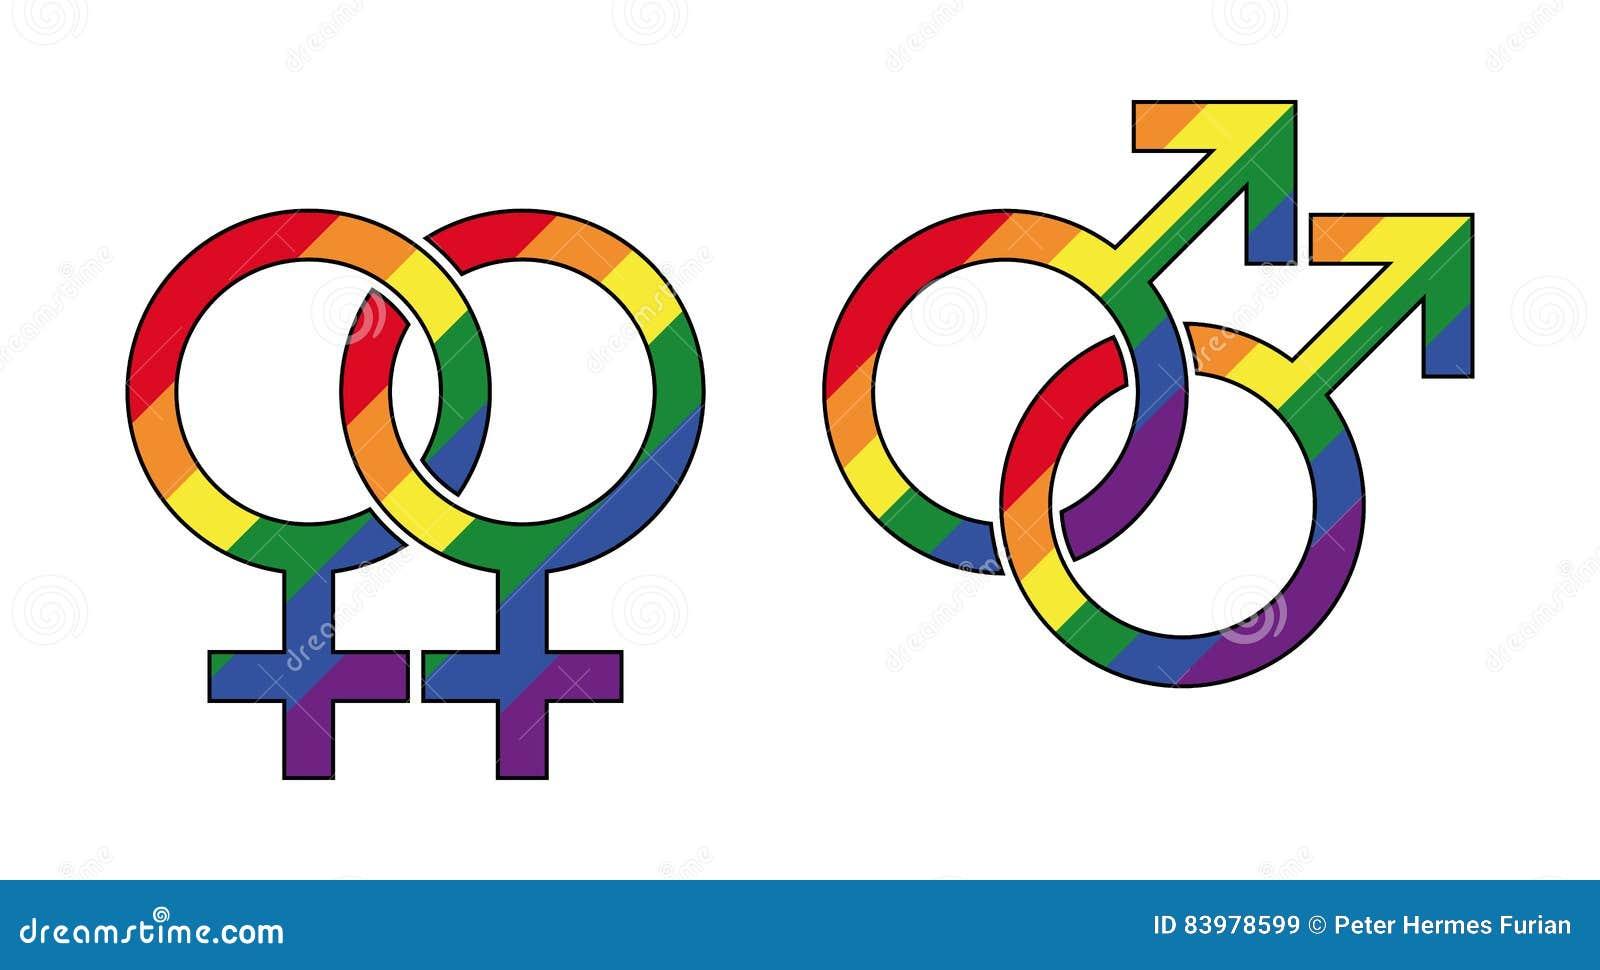 Lesbian, gay, bisexual, and transgender